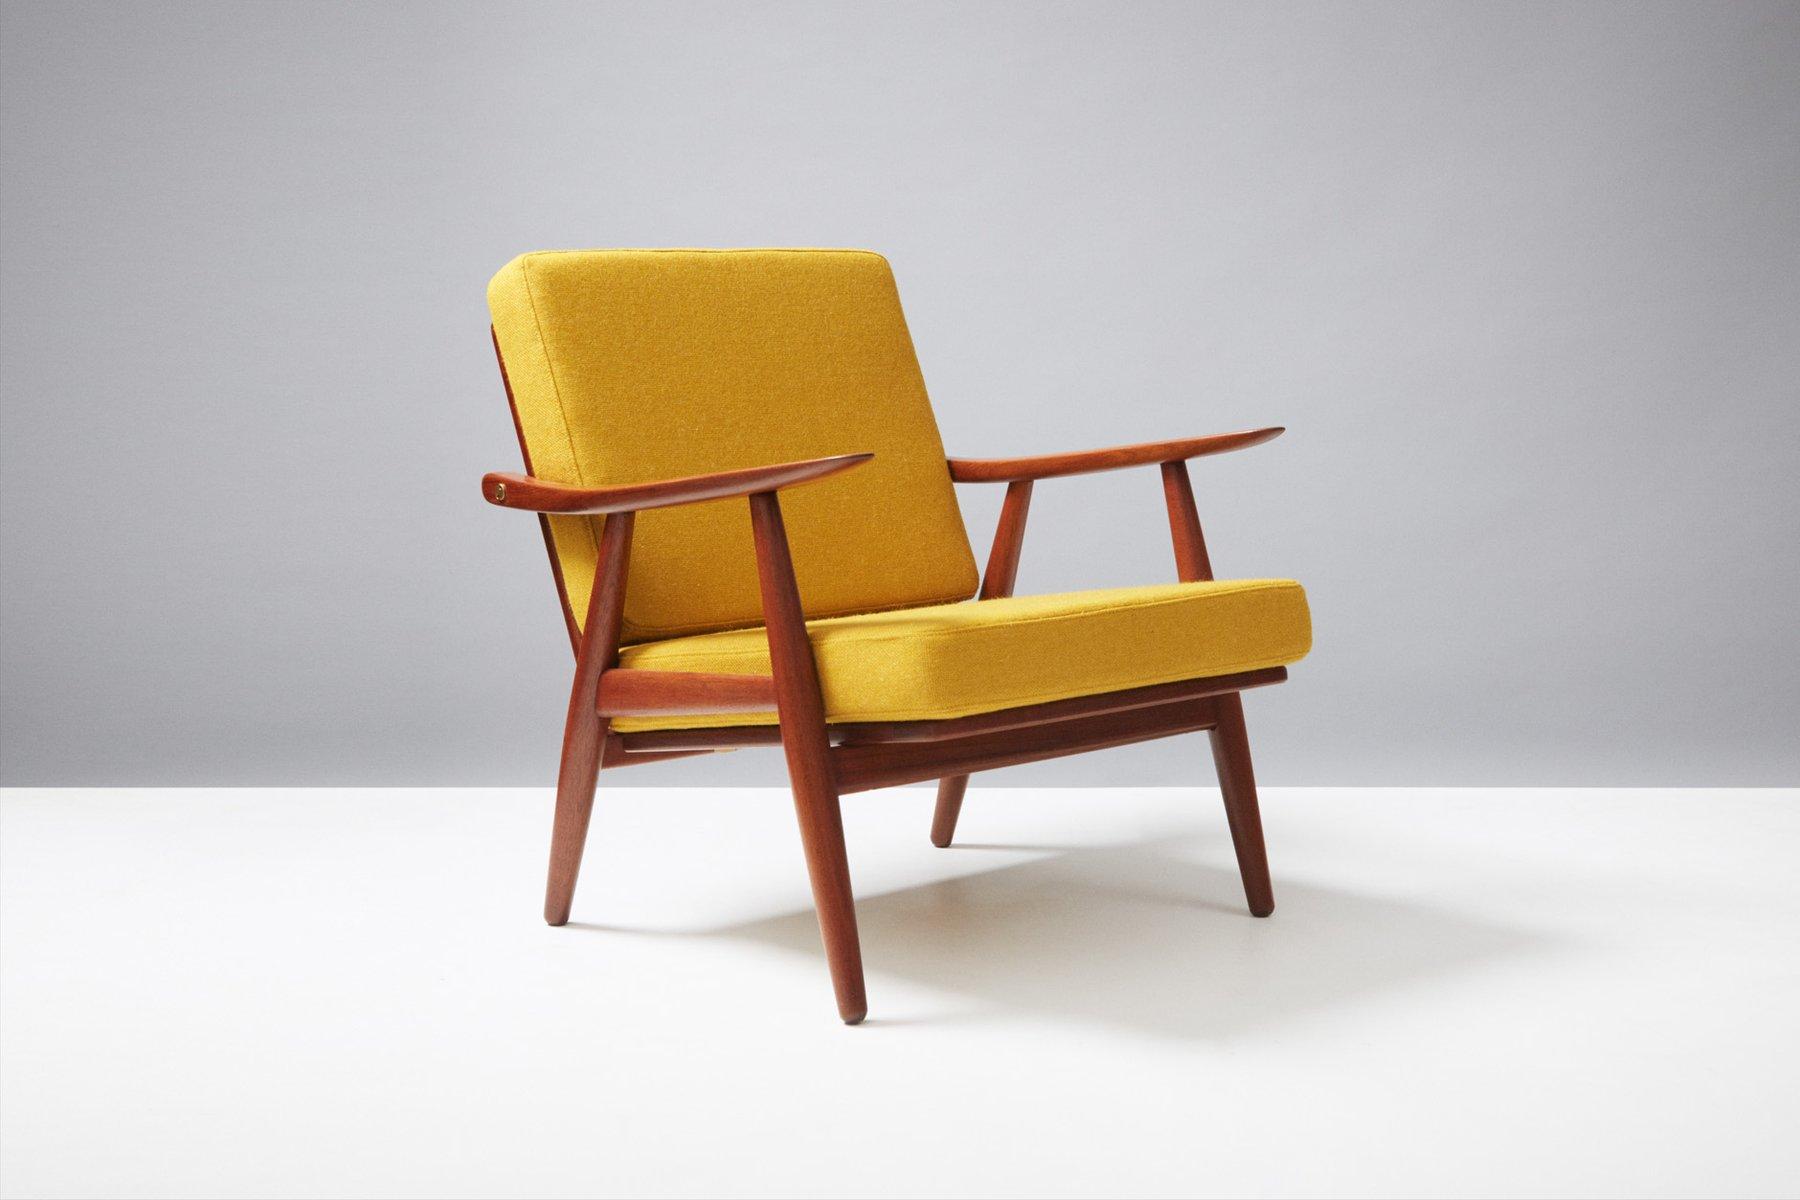 GE 270 Teak Lounge Chair By Hans Wegner For Getama, 1950s